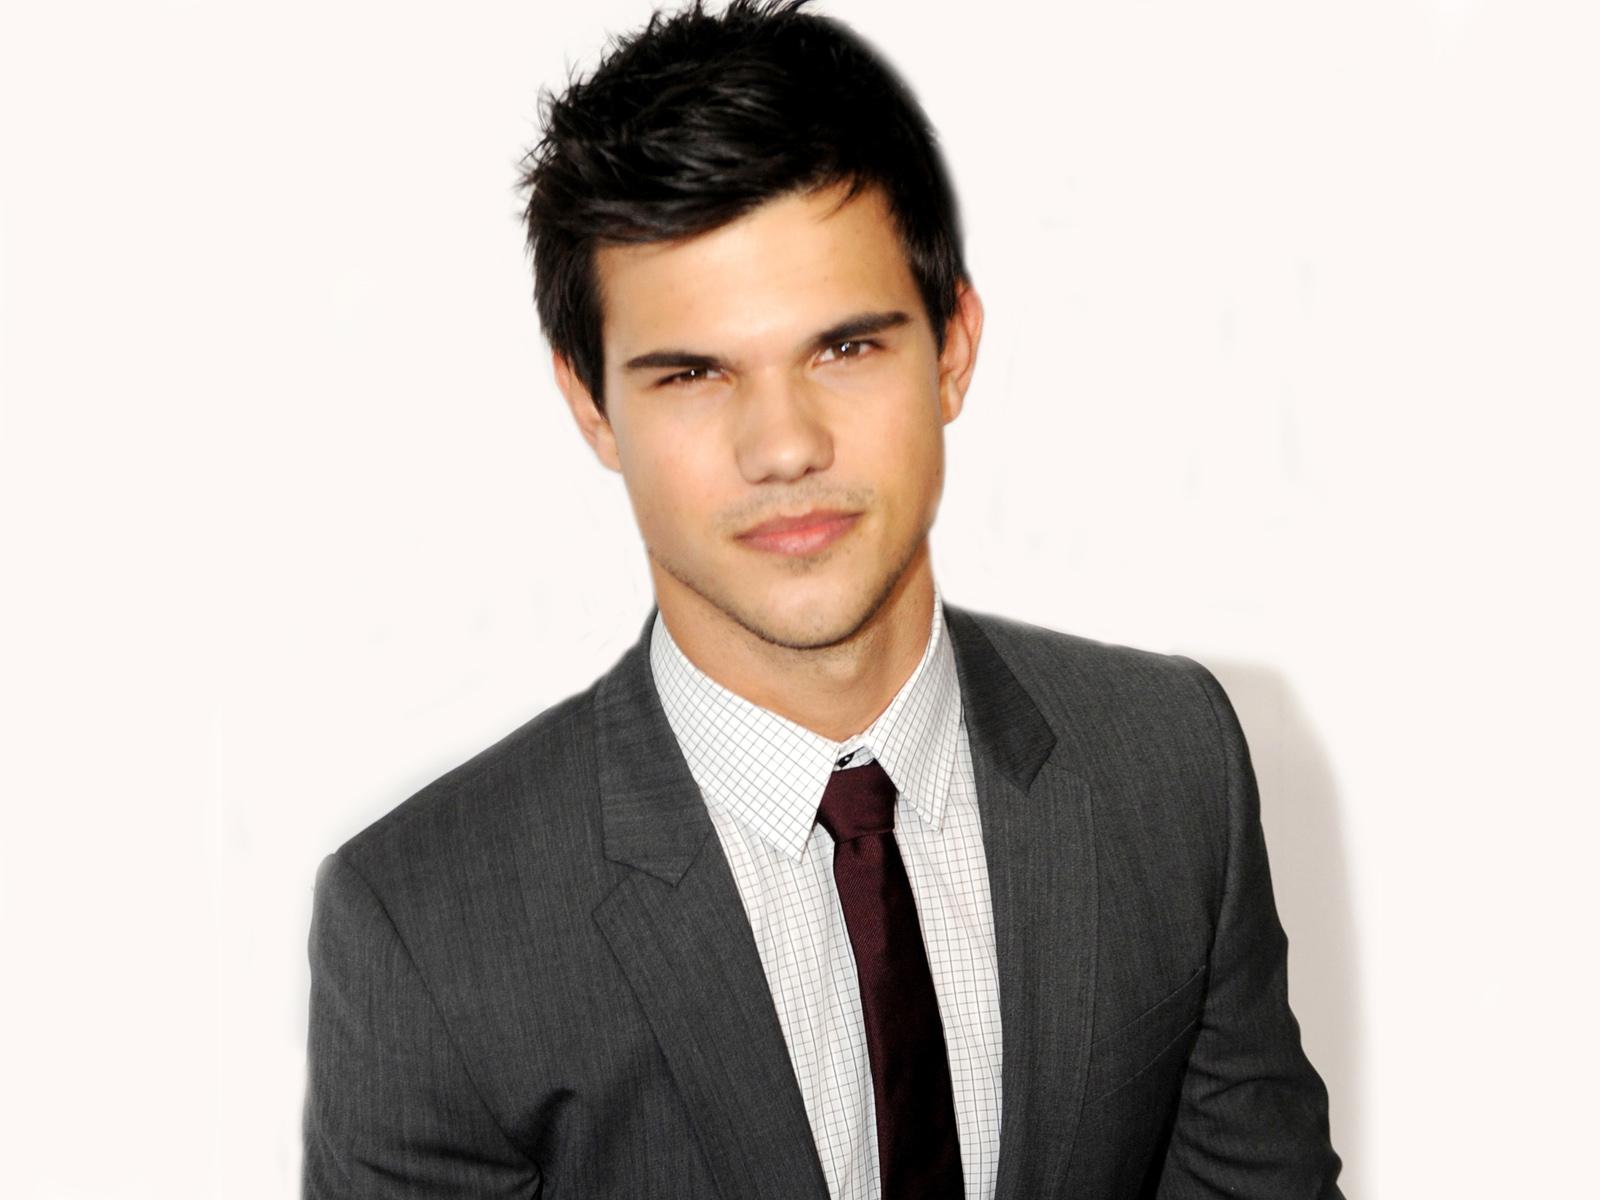 On 11-2-1992 Taylor Lautner (nickname: Tay, TLaut, Taylor Daniel Lautner) was born in Grand Rapids, Michigan, United States.